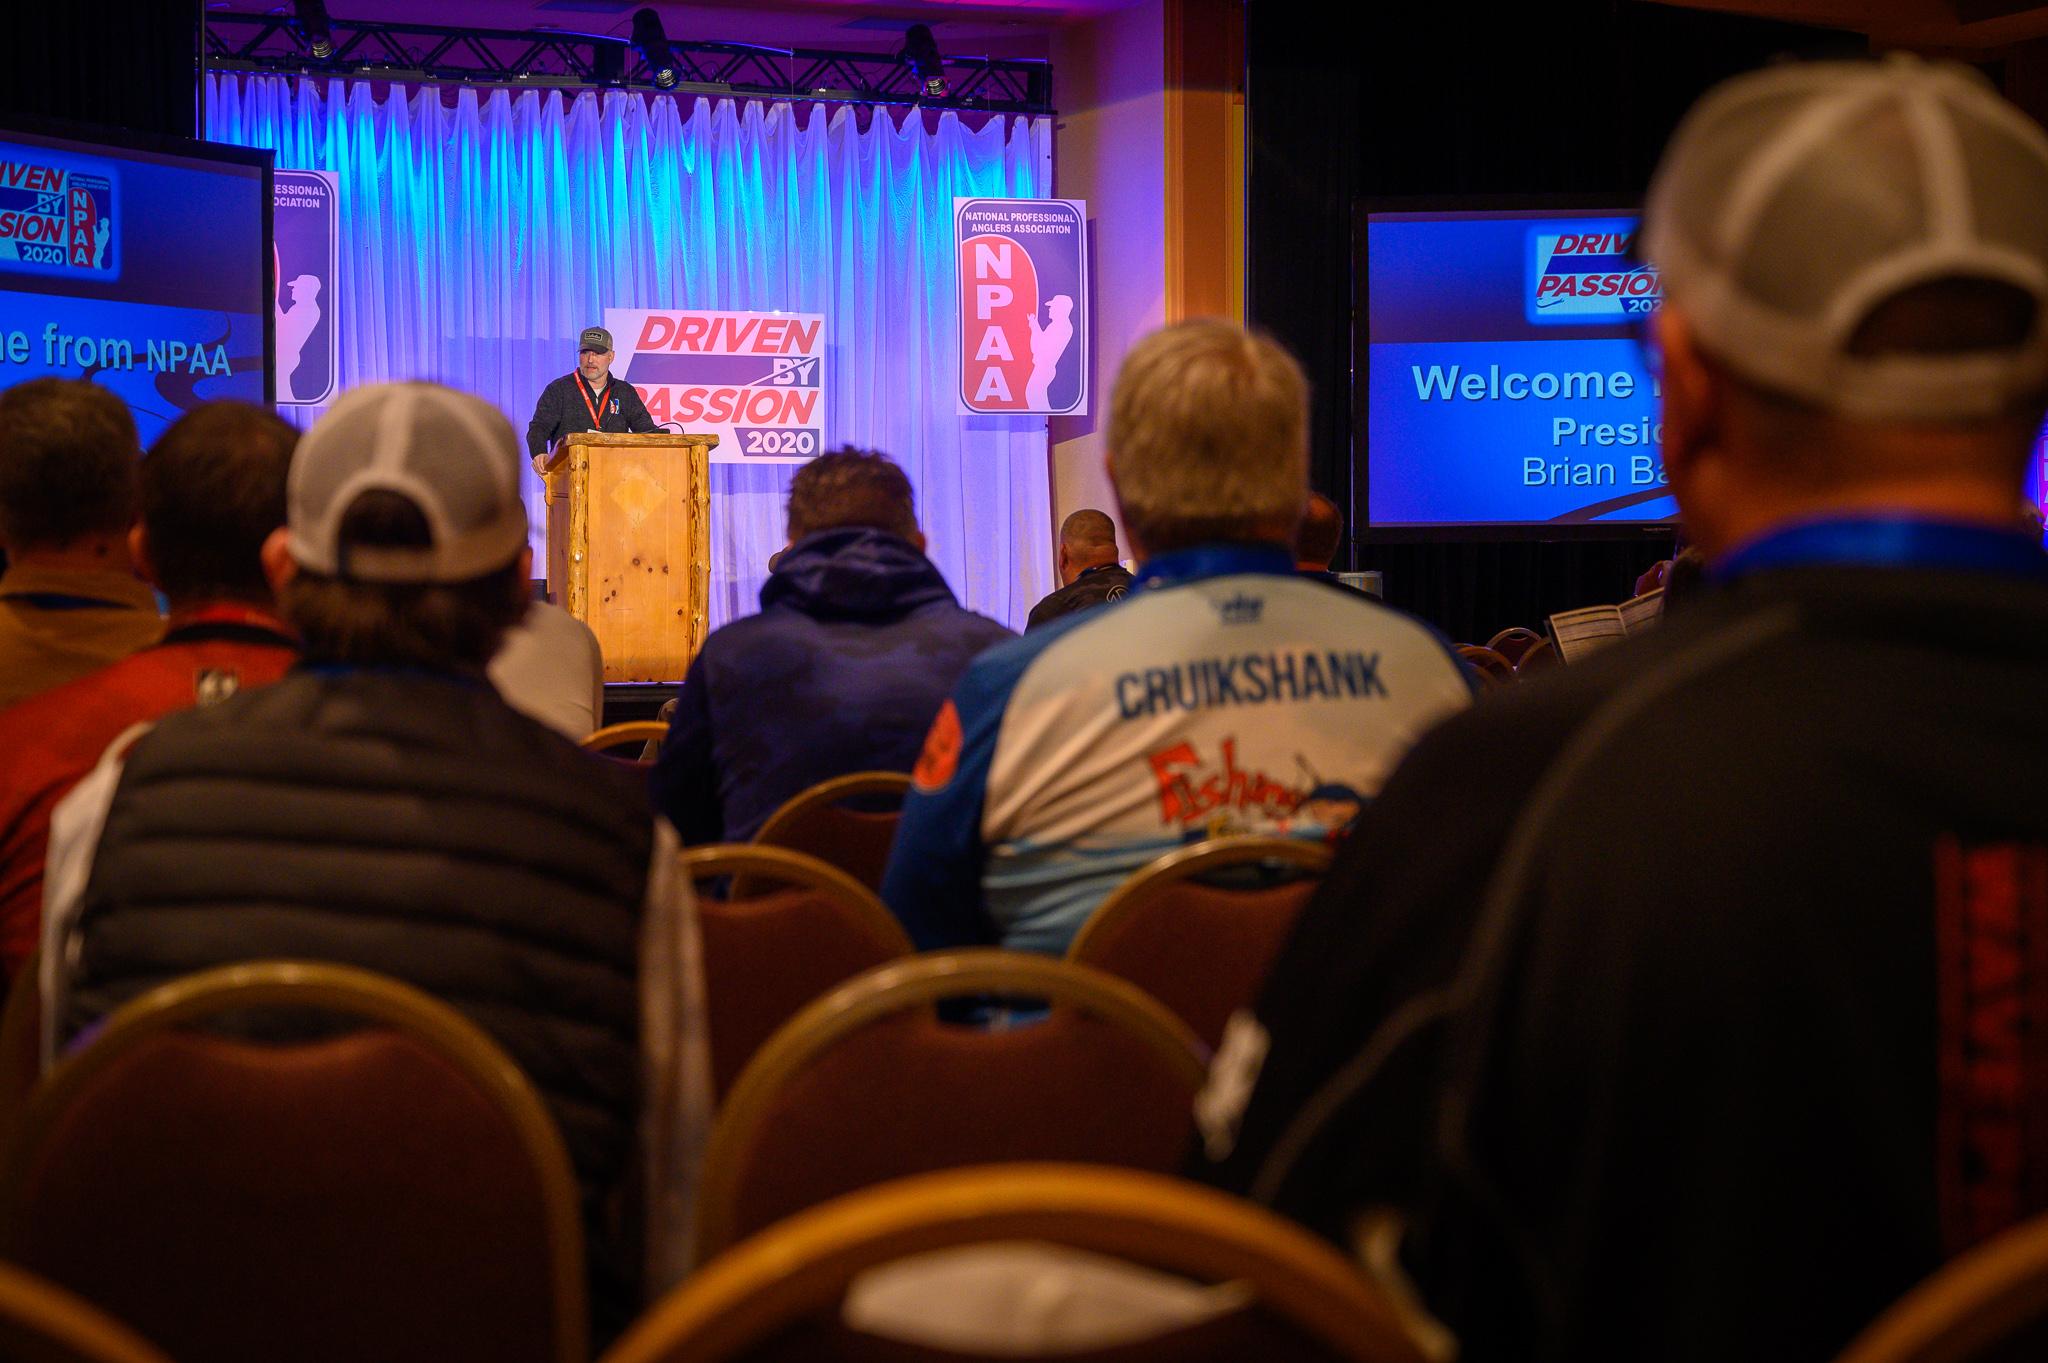 NPAA Members Attend the NPAA Conference